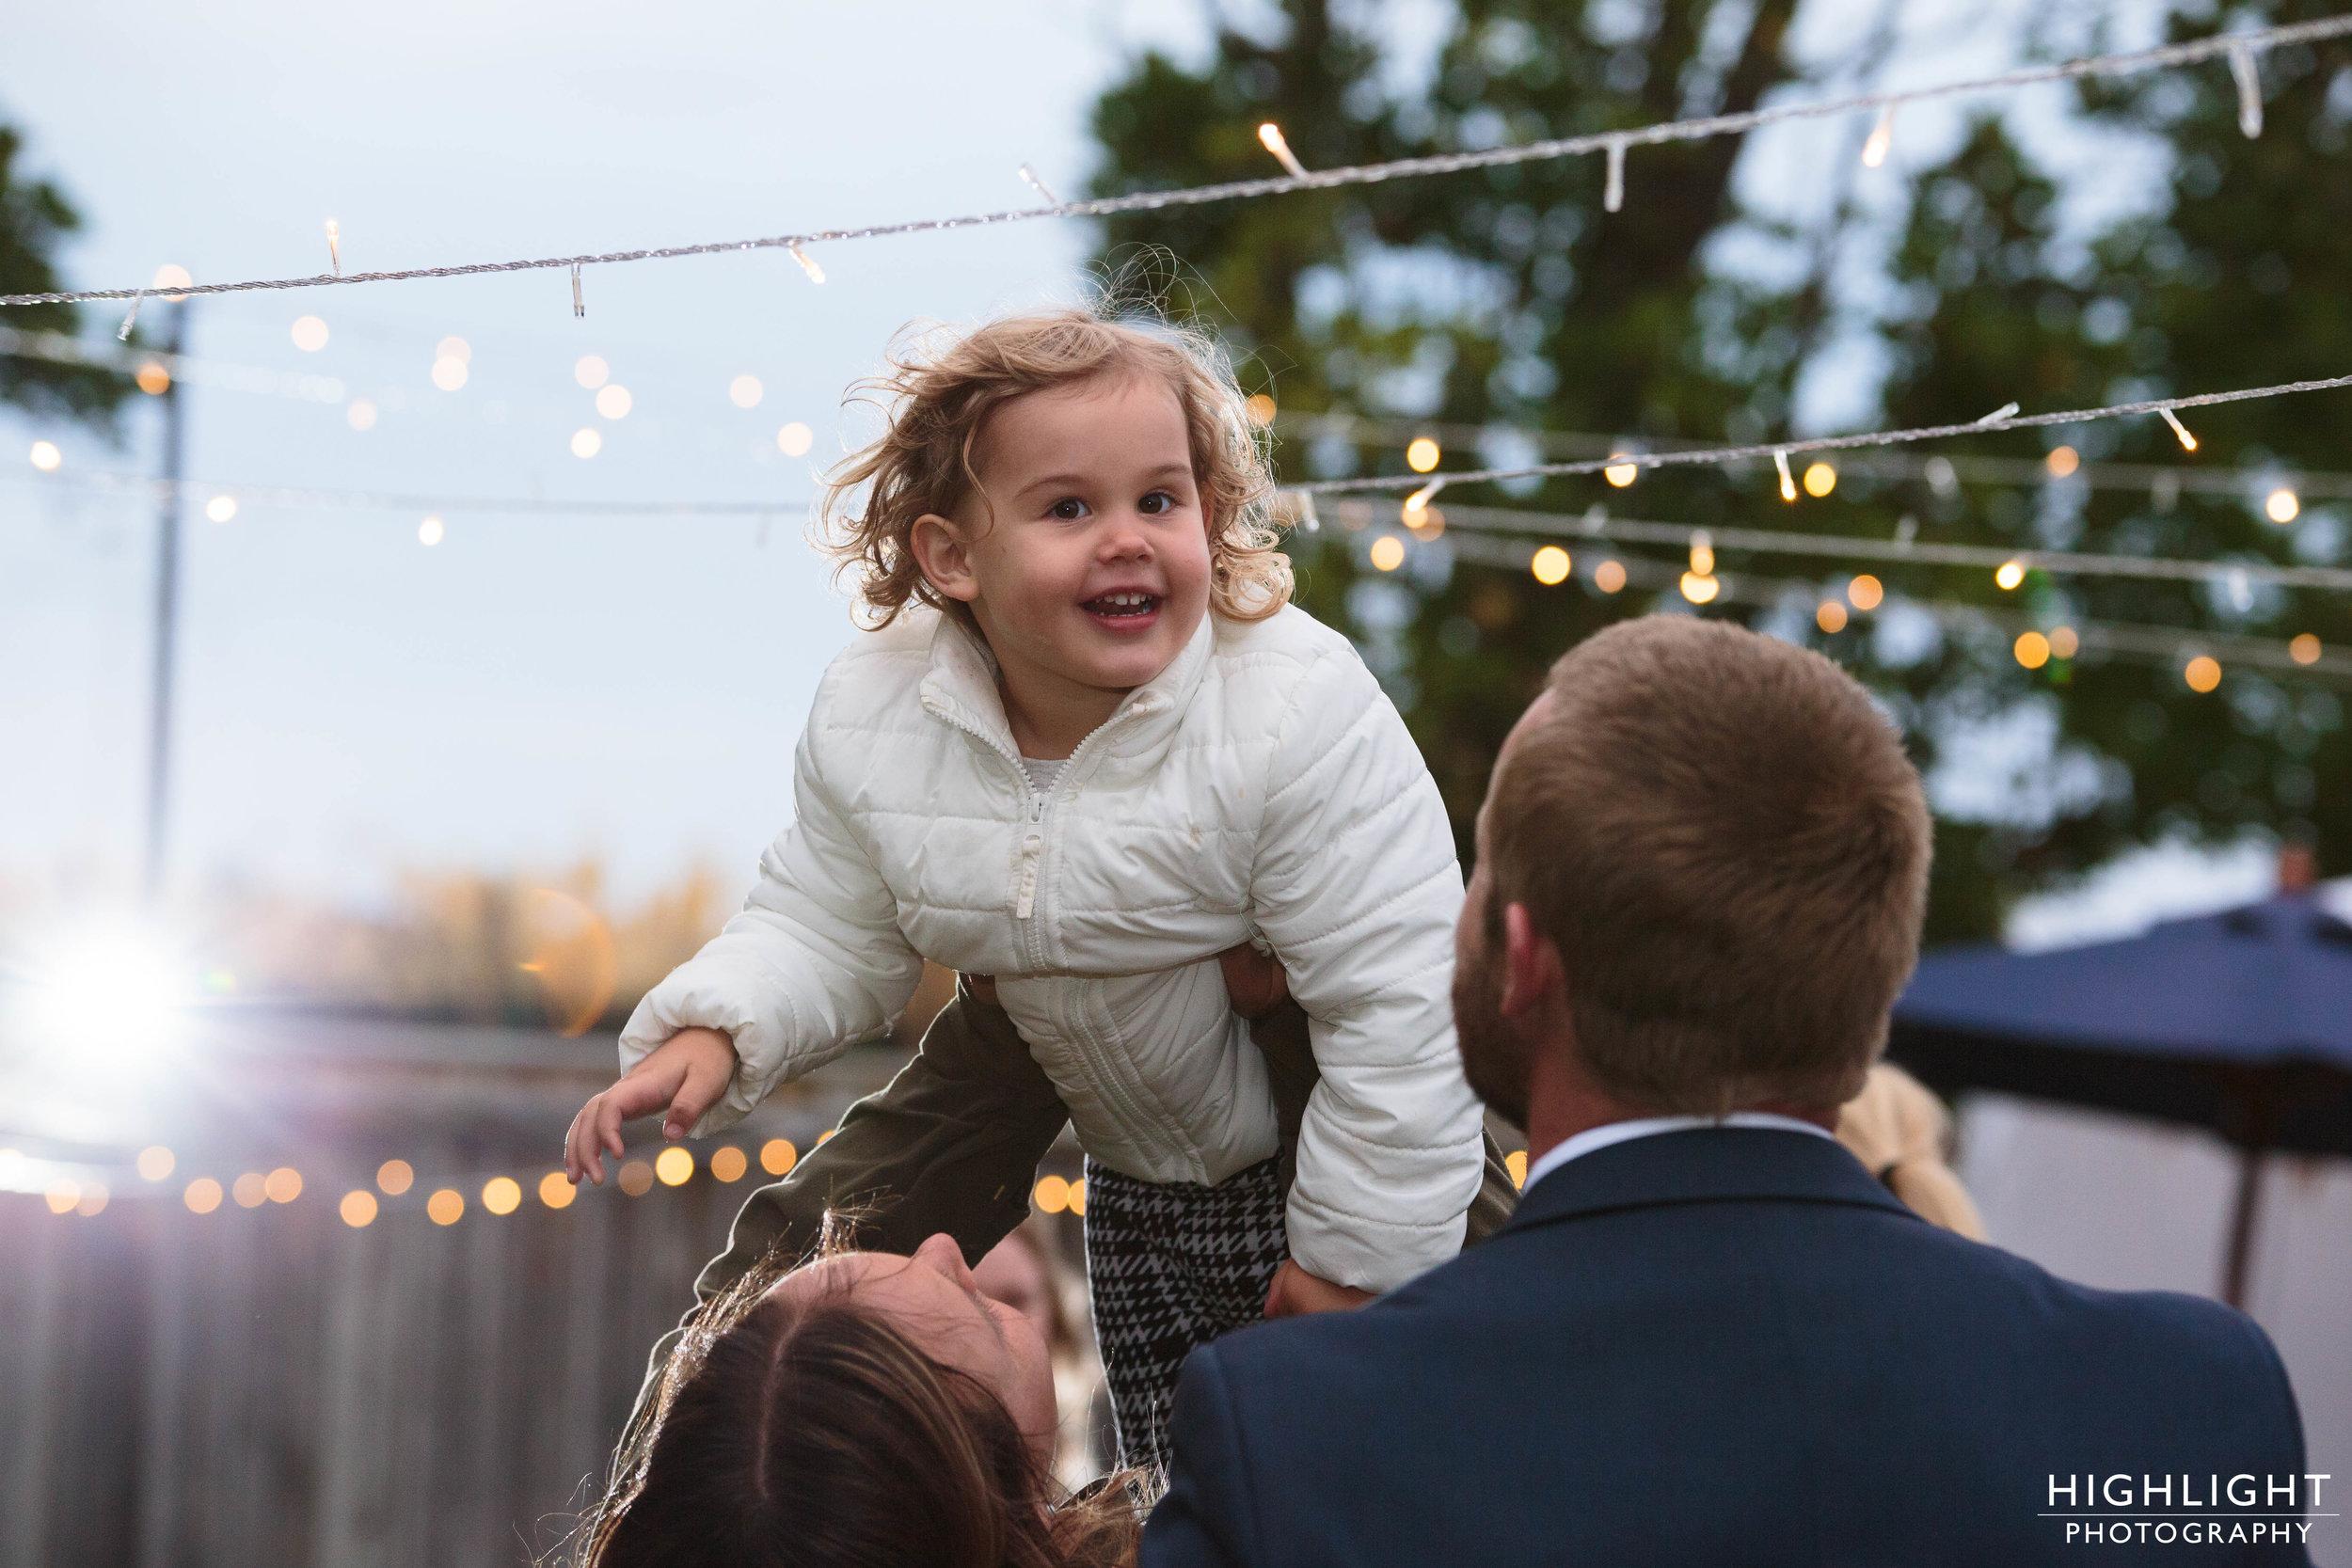 JM-2017-Highlight-wedding-photography-palmerston-north-new-zealand-232.jpg